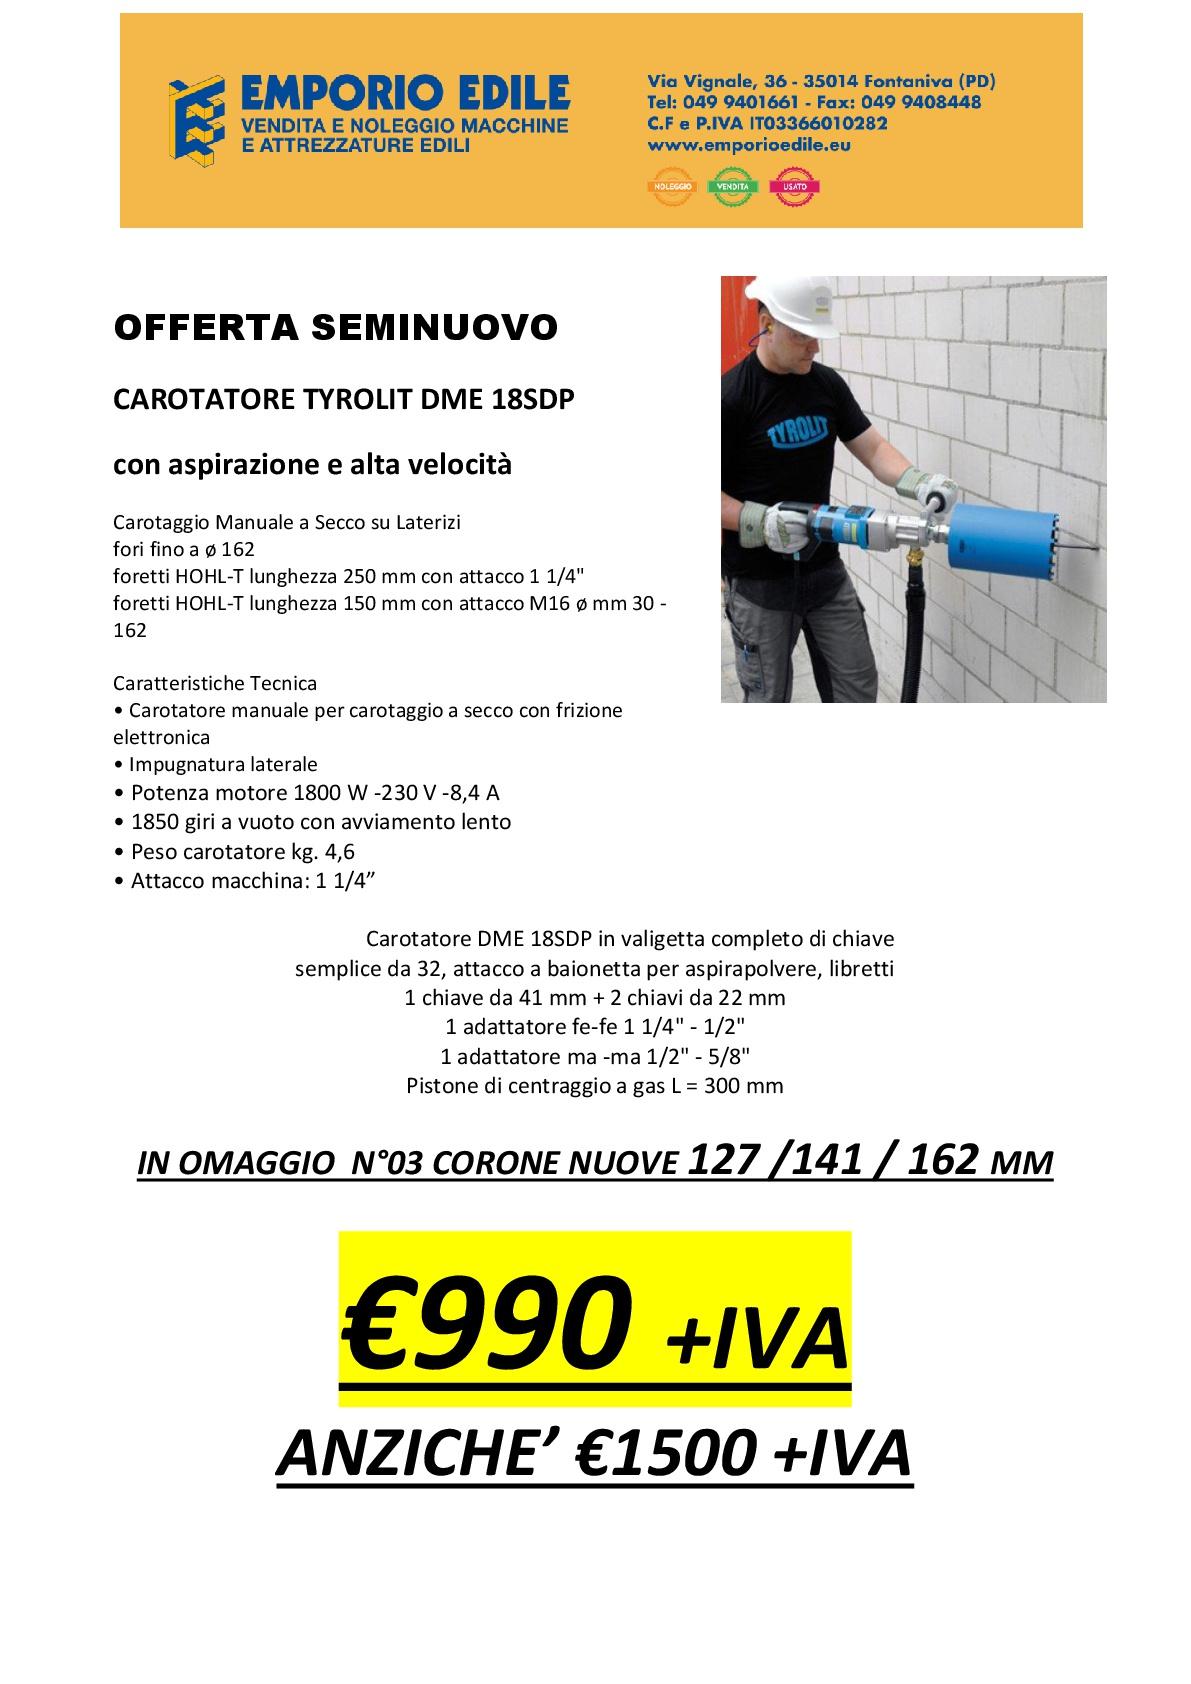 Offerta Carotatrice Tyrolit DME18sdp